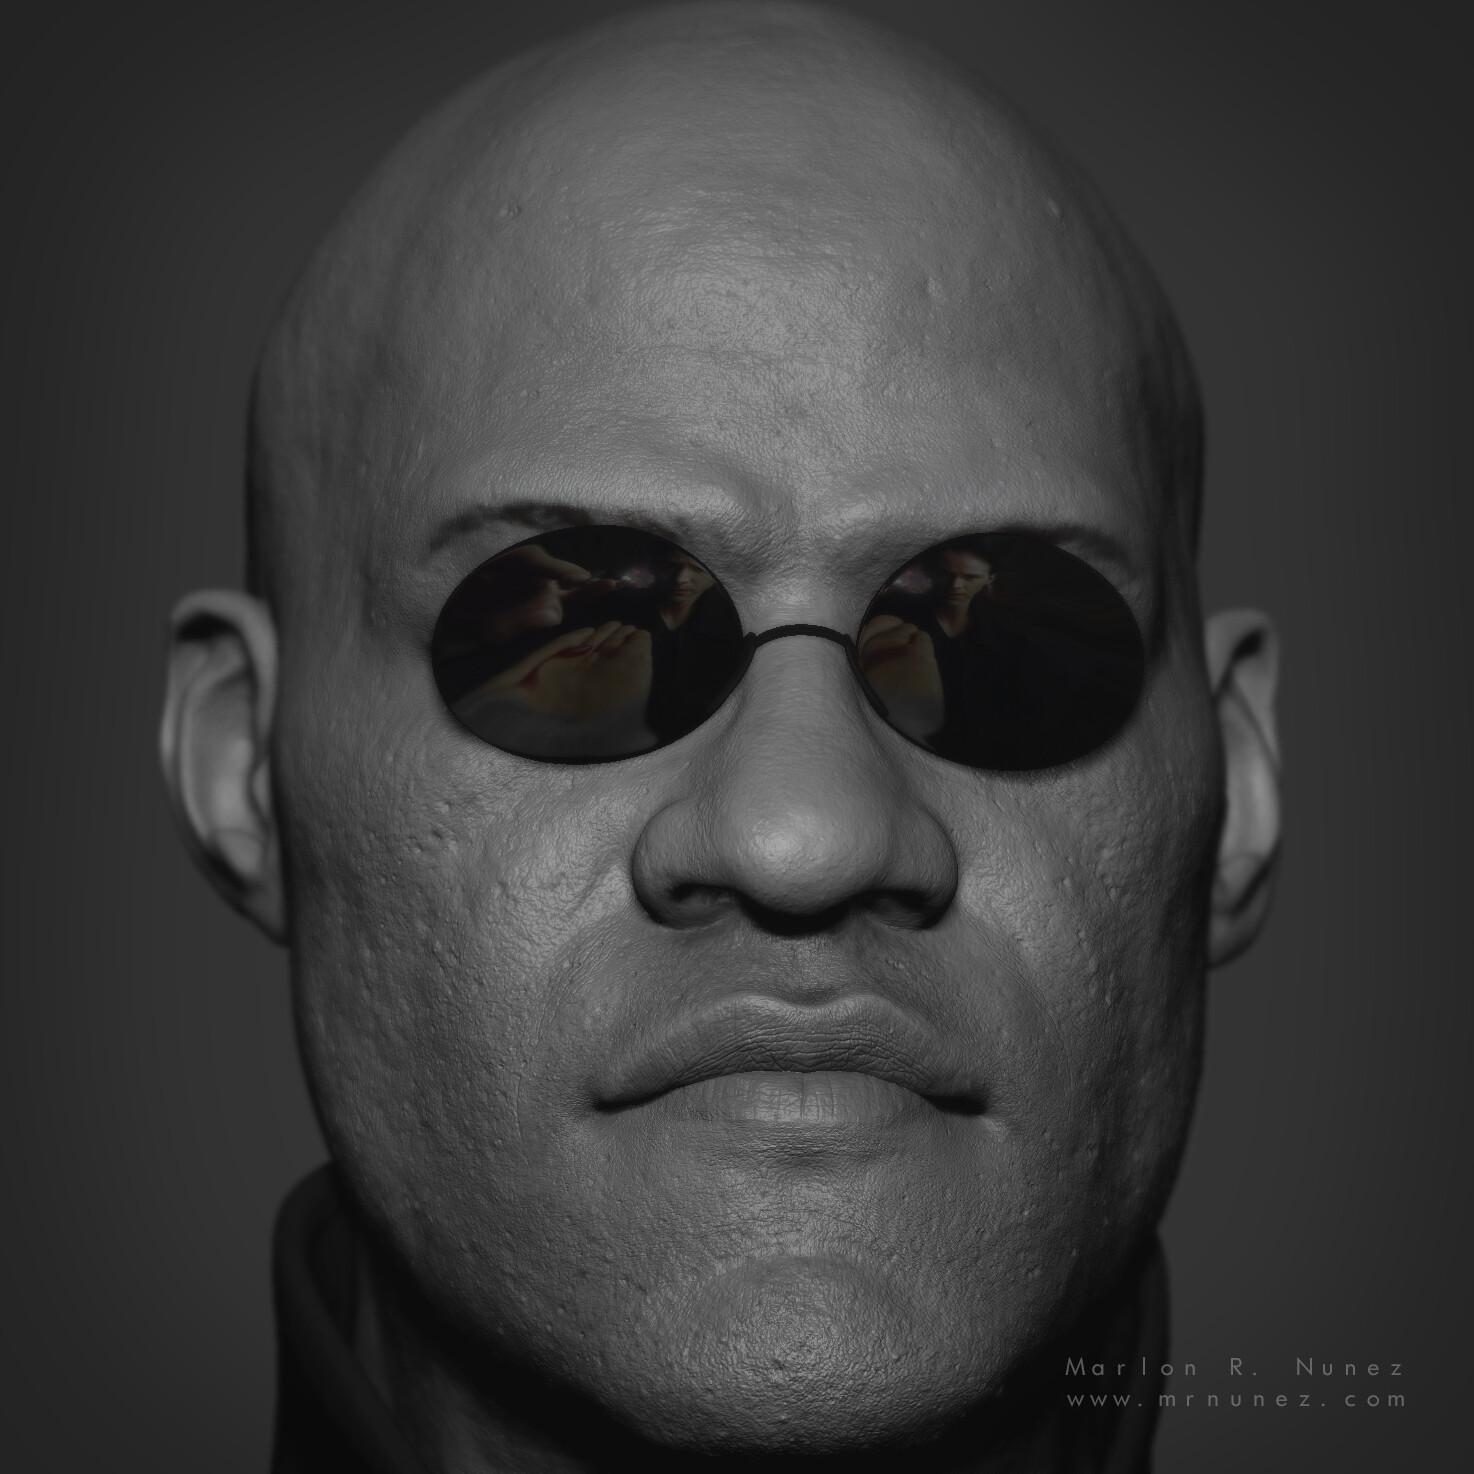 Marlon r nunez morpheus glasses